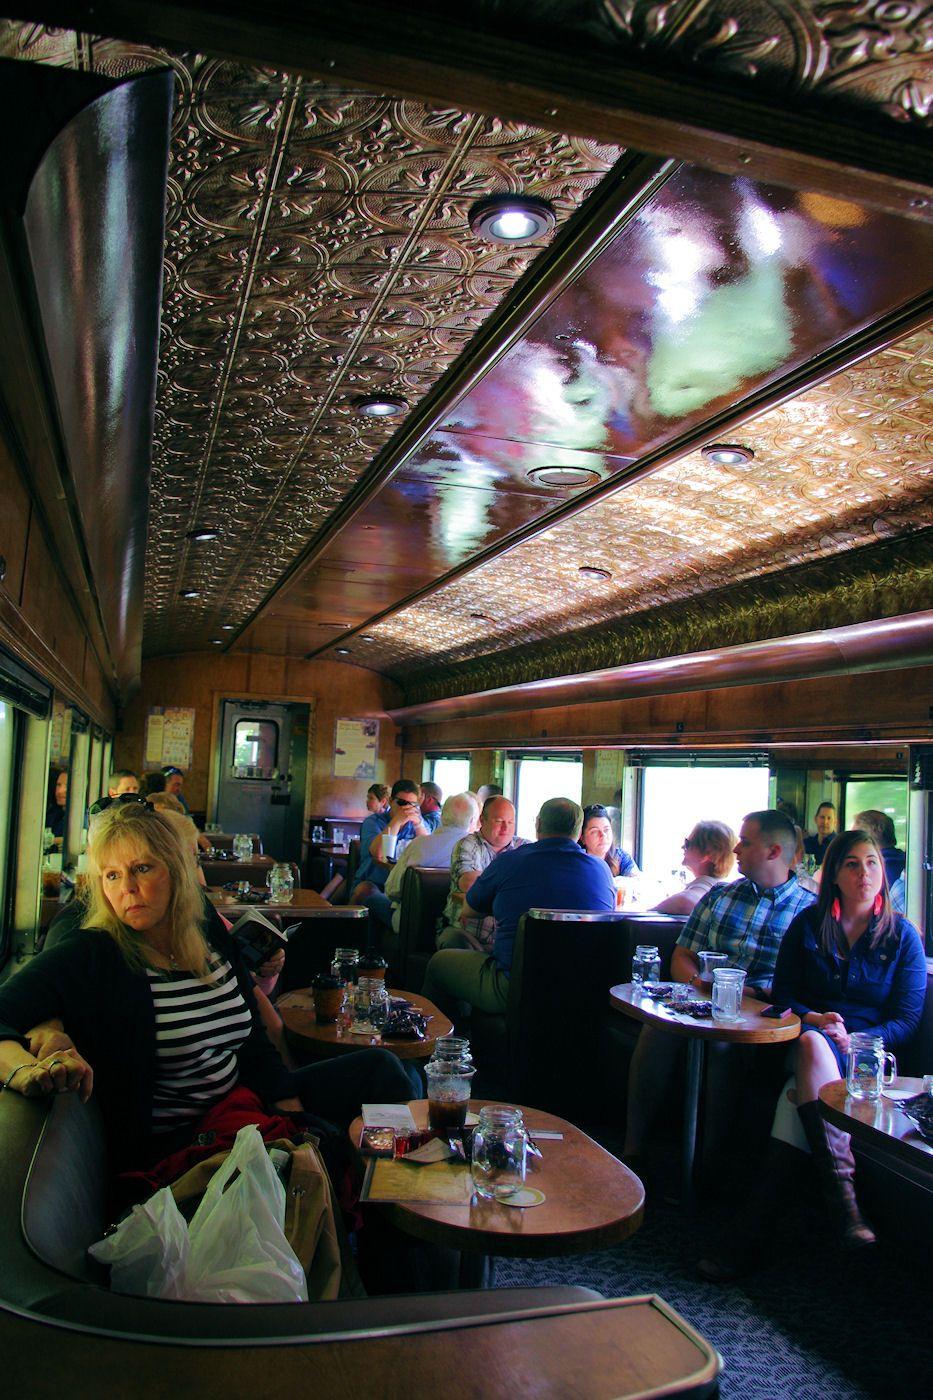 Restored Carolina Moonshine car on the Great Smoky Mountains Railroad train excursion